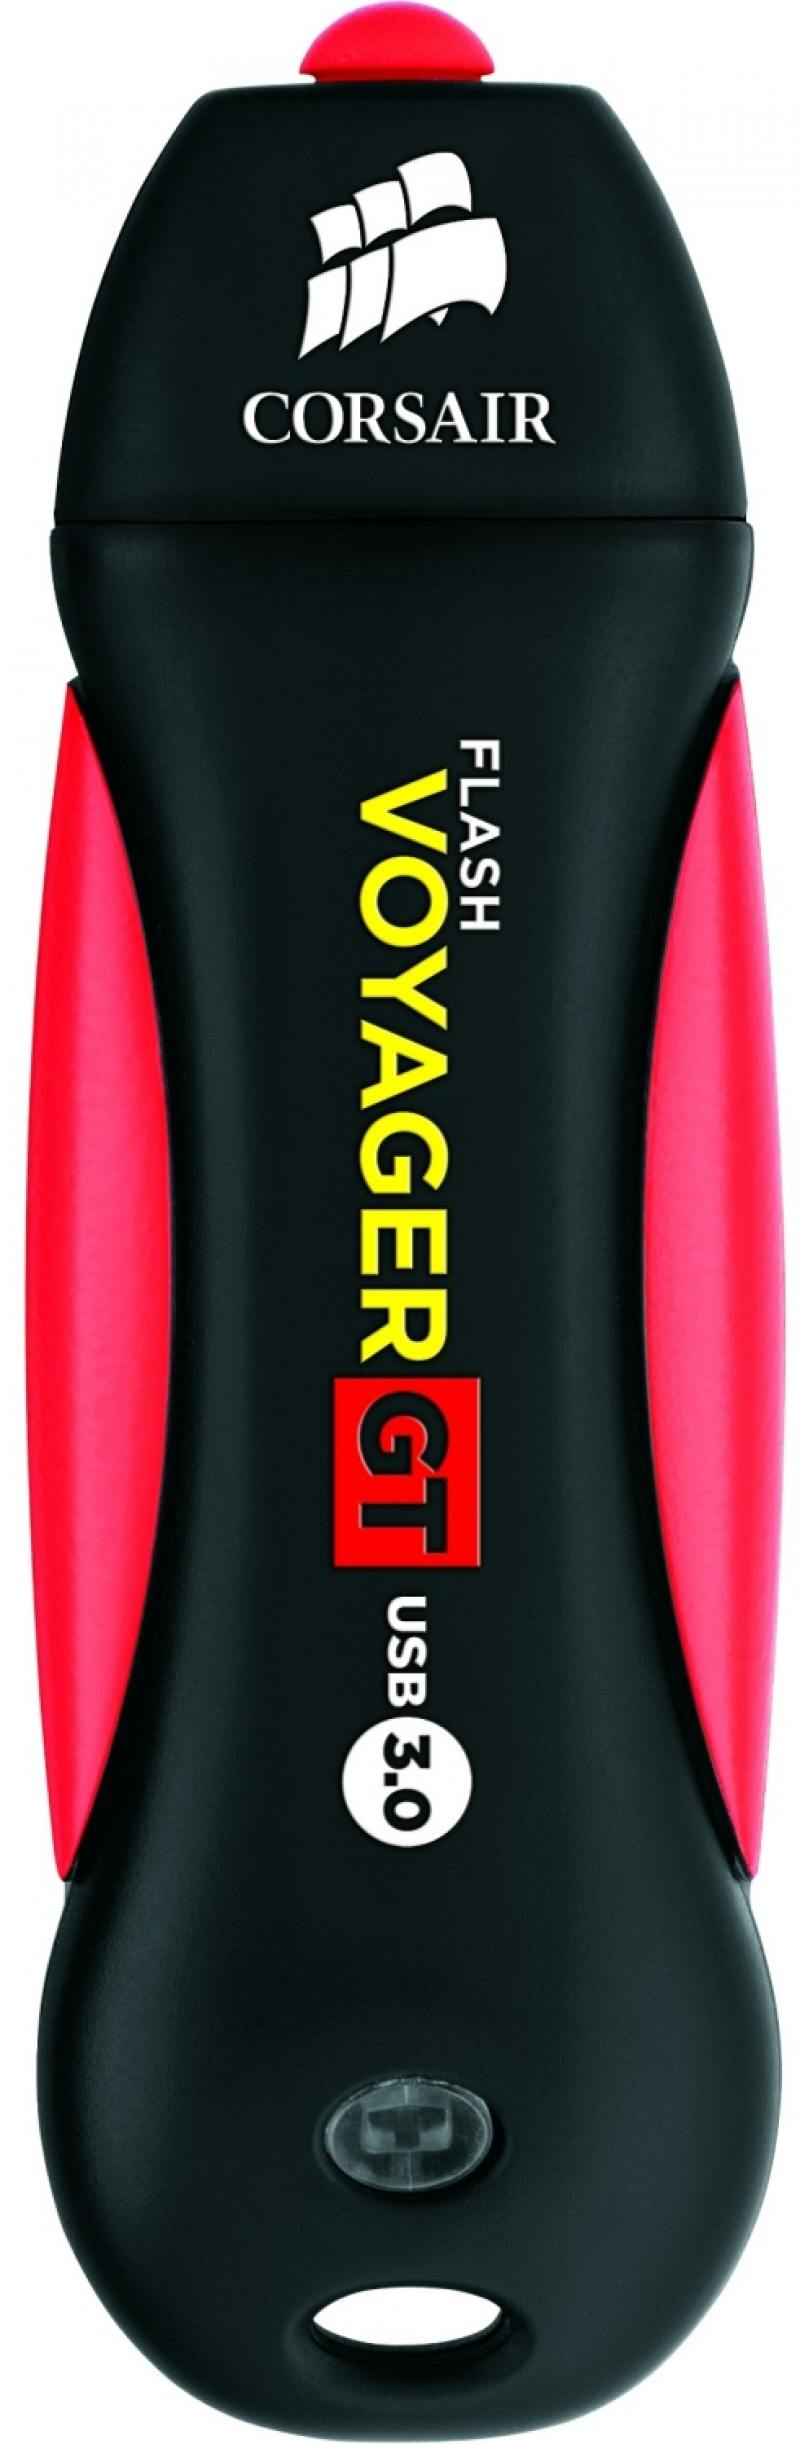 Флешка USB 128Gb Corsair Voyager GT USB3.0 CMFVYGT3B-128GB черно-красный usb flash накопитель 128gb kingston hyperx hxs3 128gb usb3 1 черный